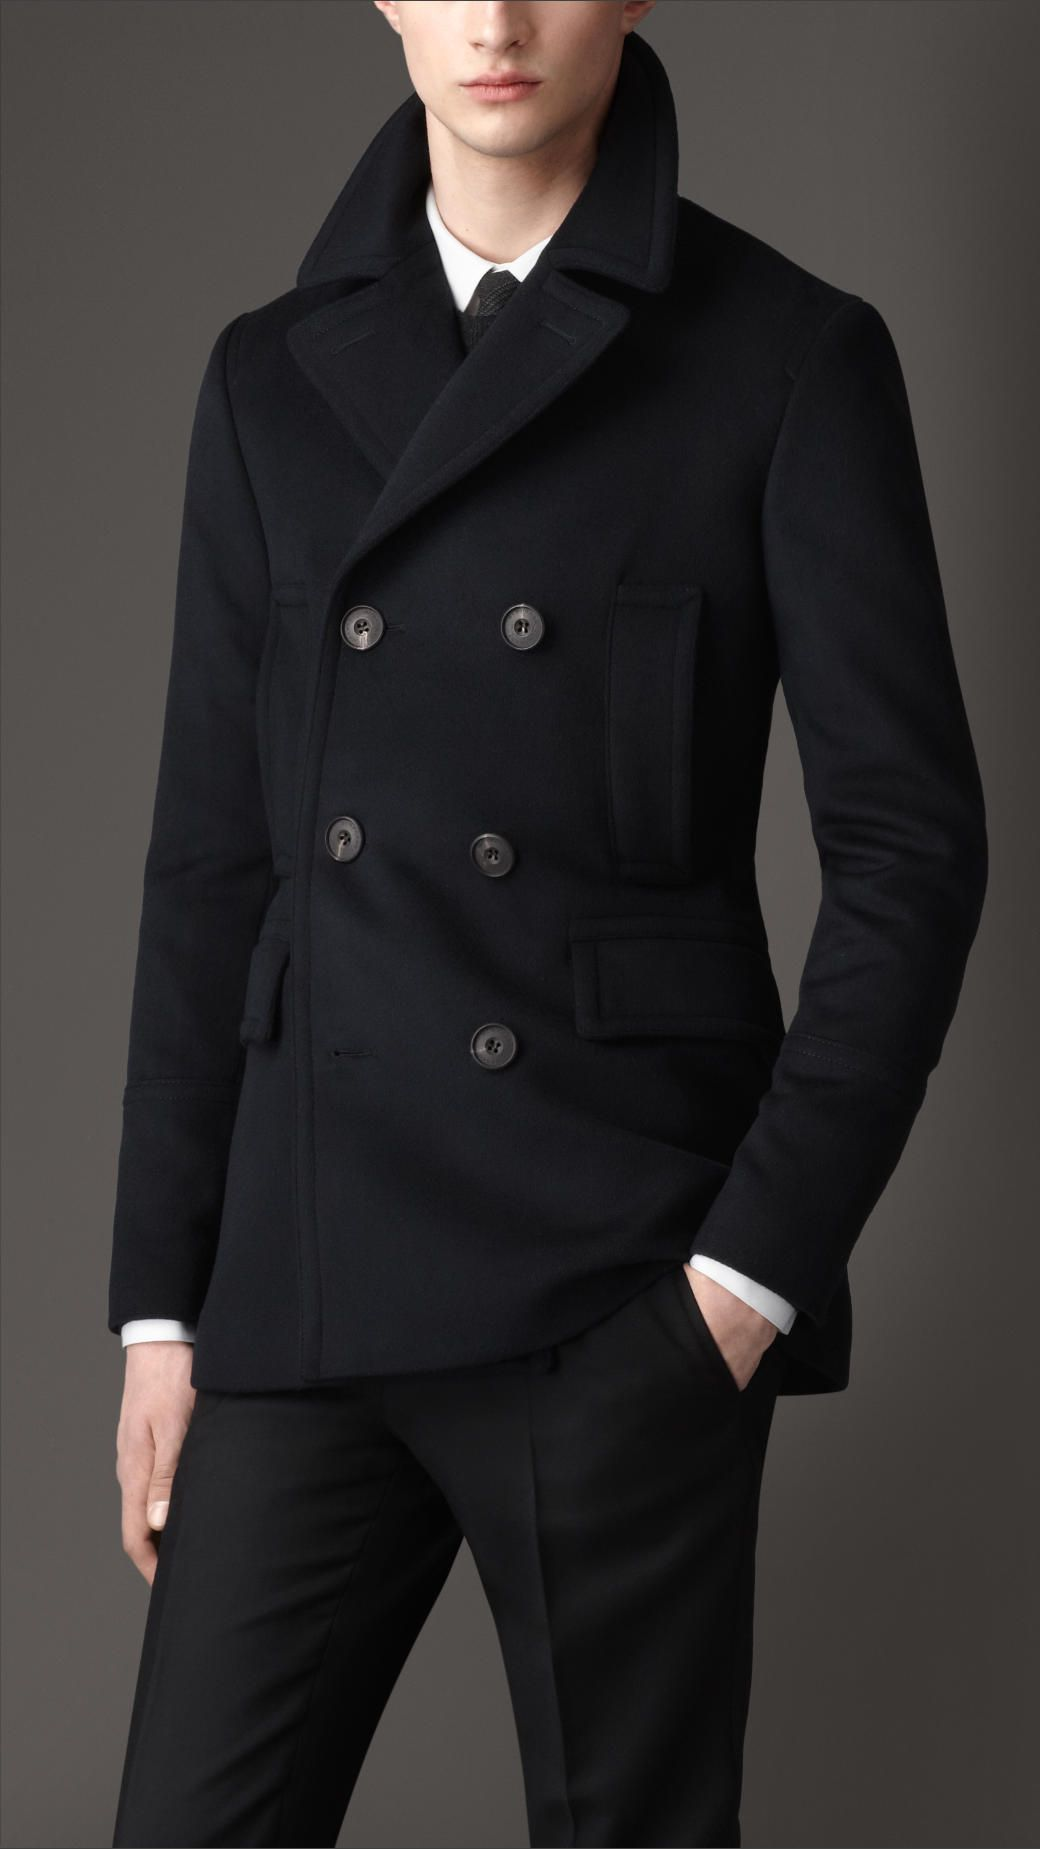 Virgin Wool Cashmere Pea Coat | Burberry | Men's Autumn/Winter ...